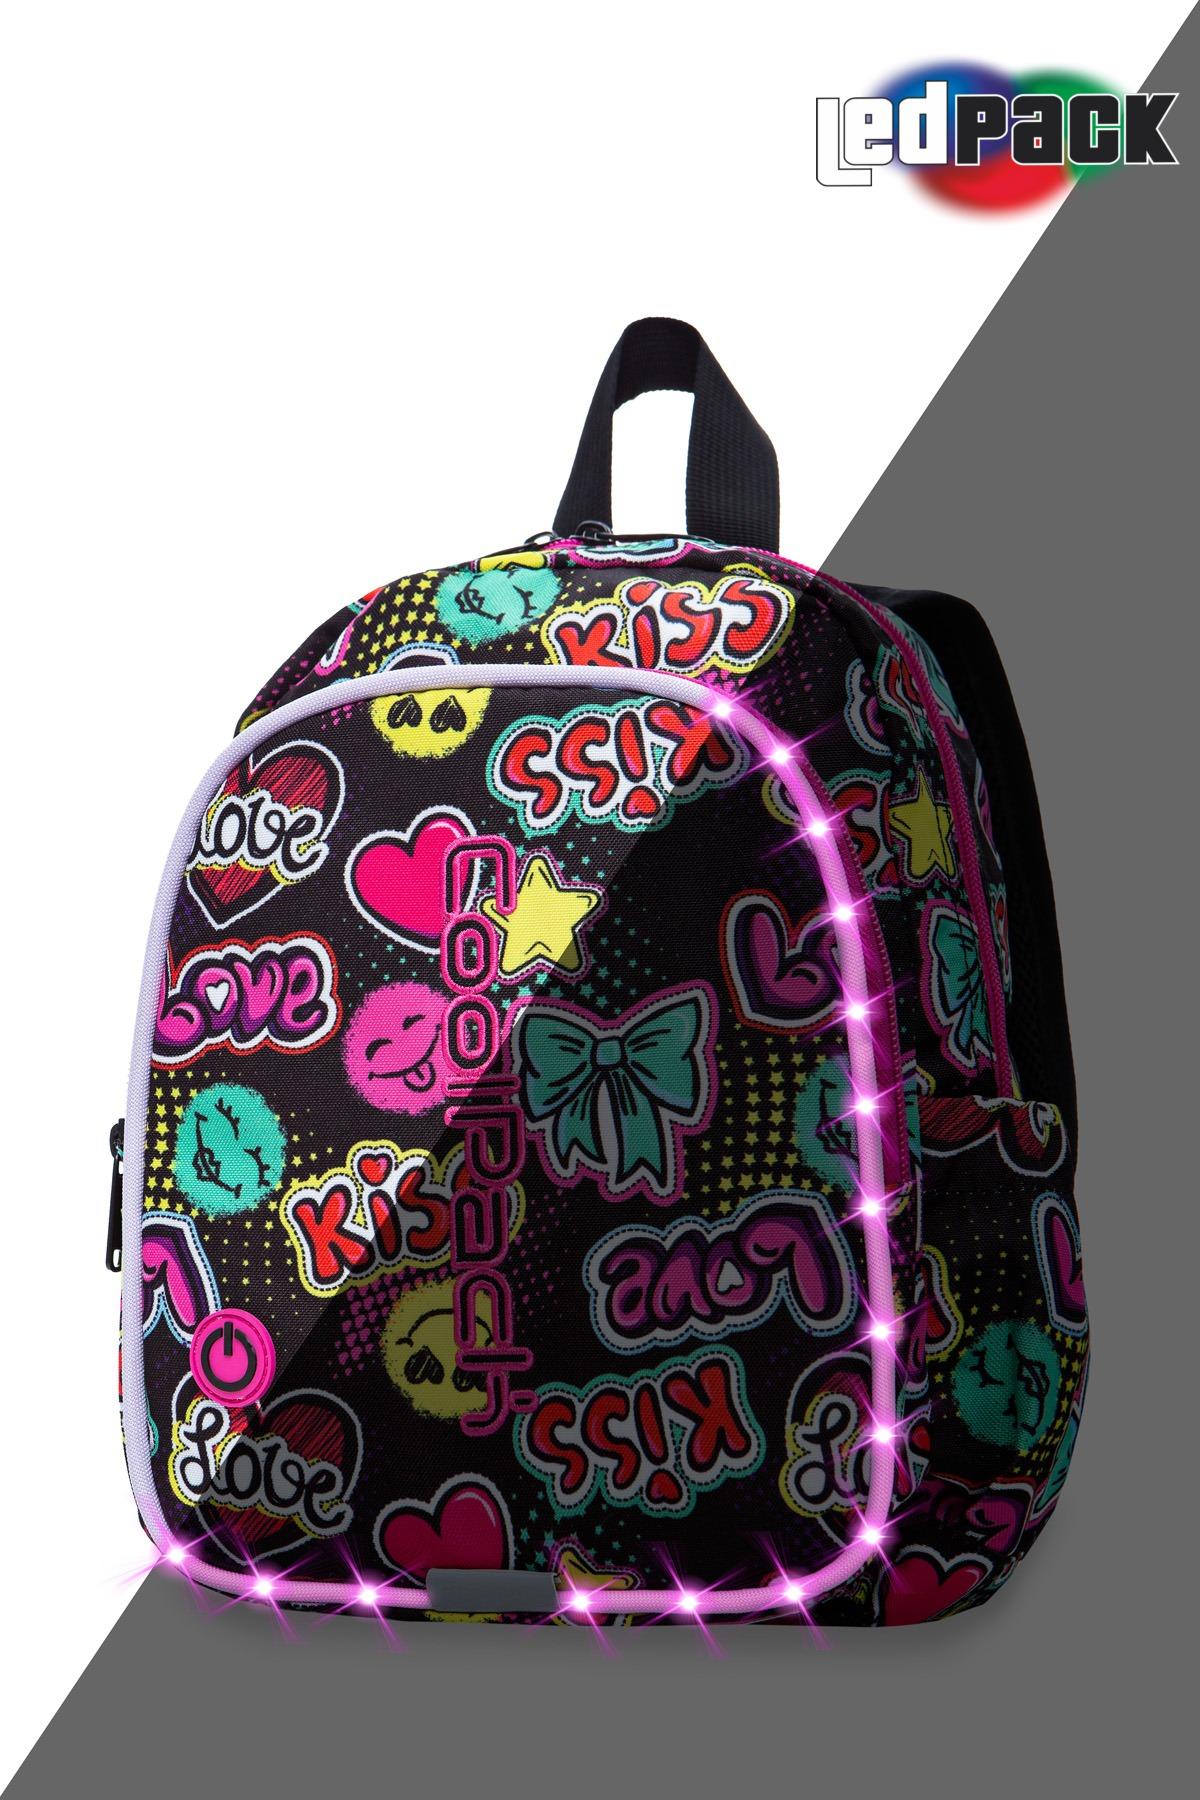 Coolpack - bobby - kids backpack - led emoticons